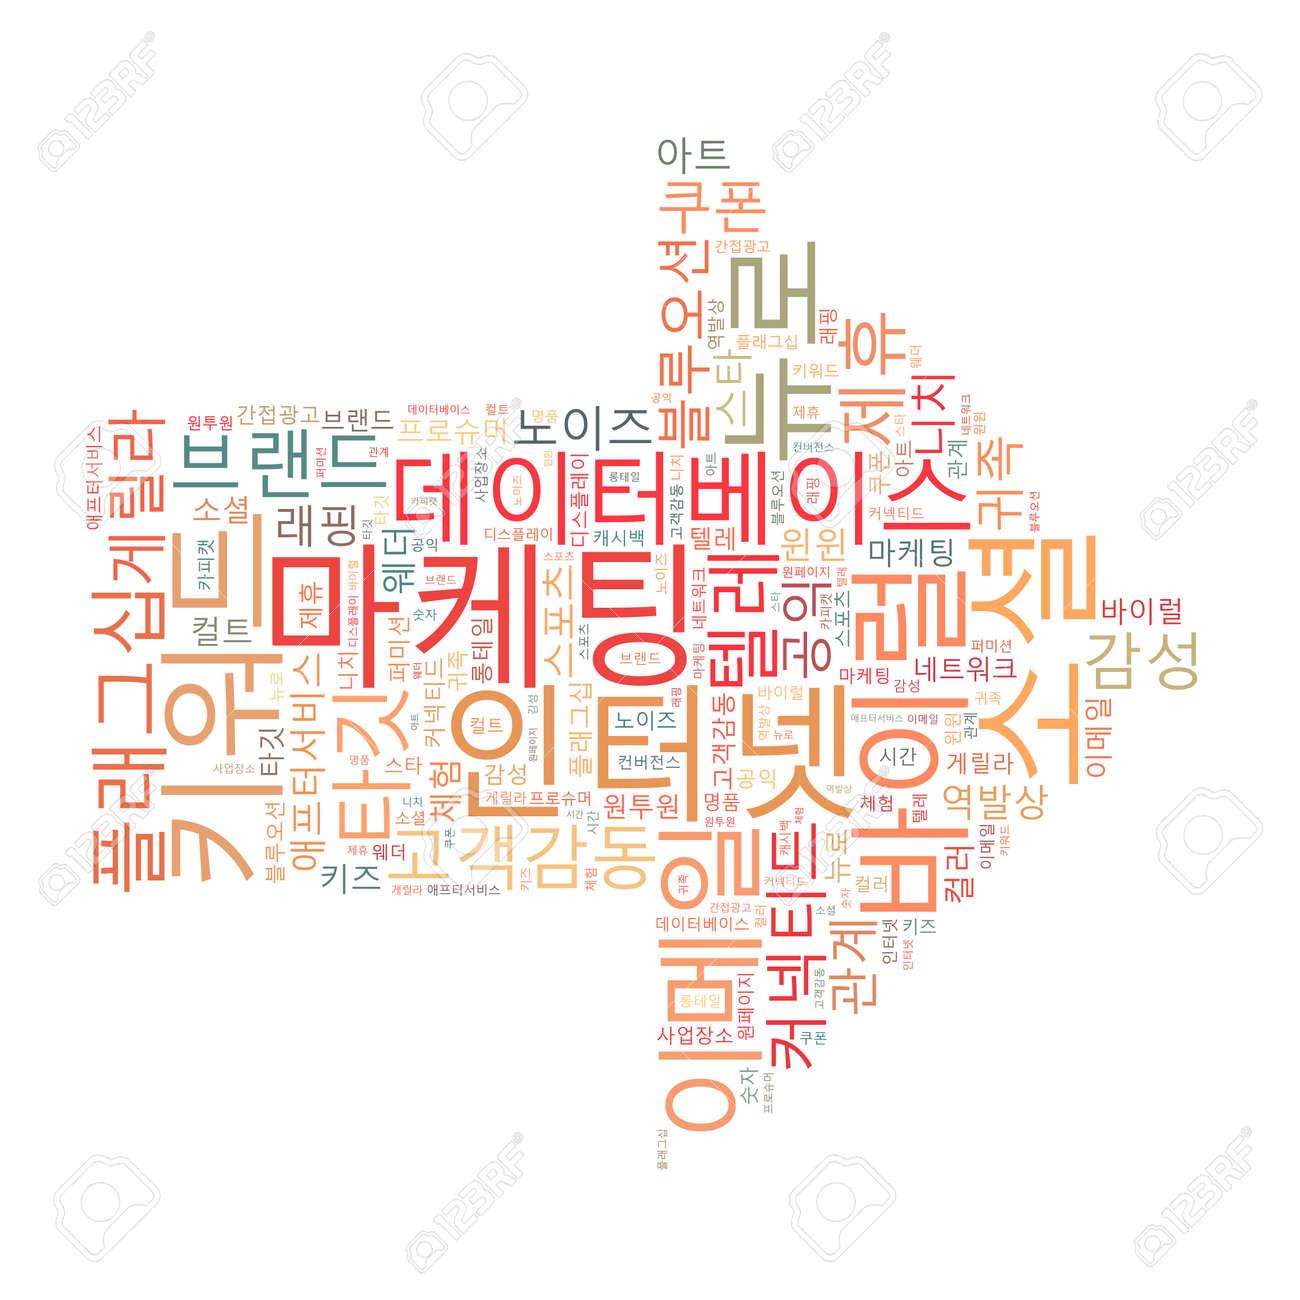 Korean Marketing Keyword Cloud Stock Photo - 25135100